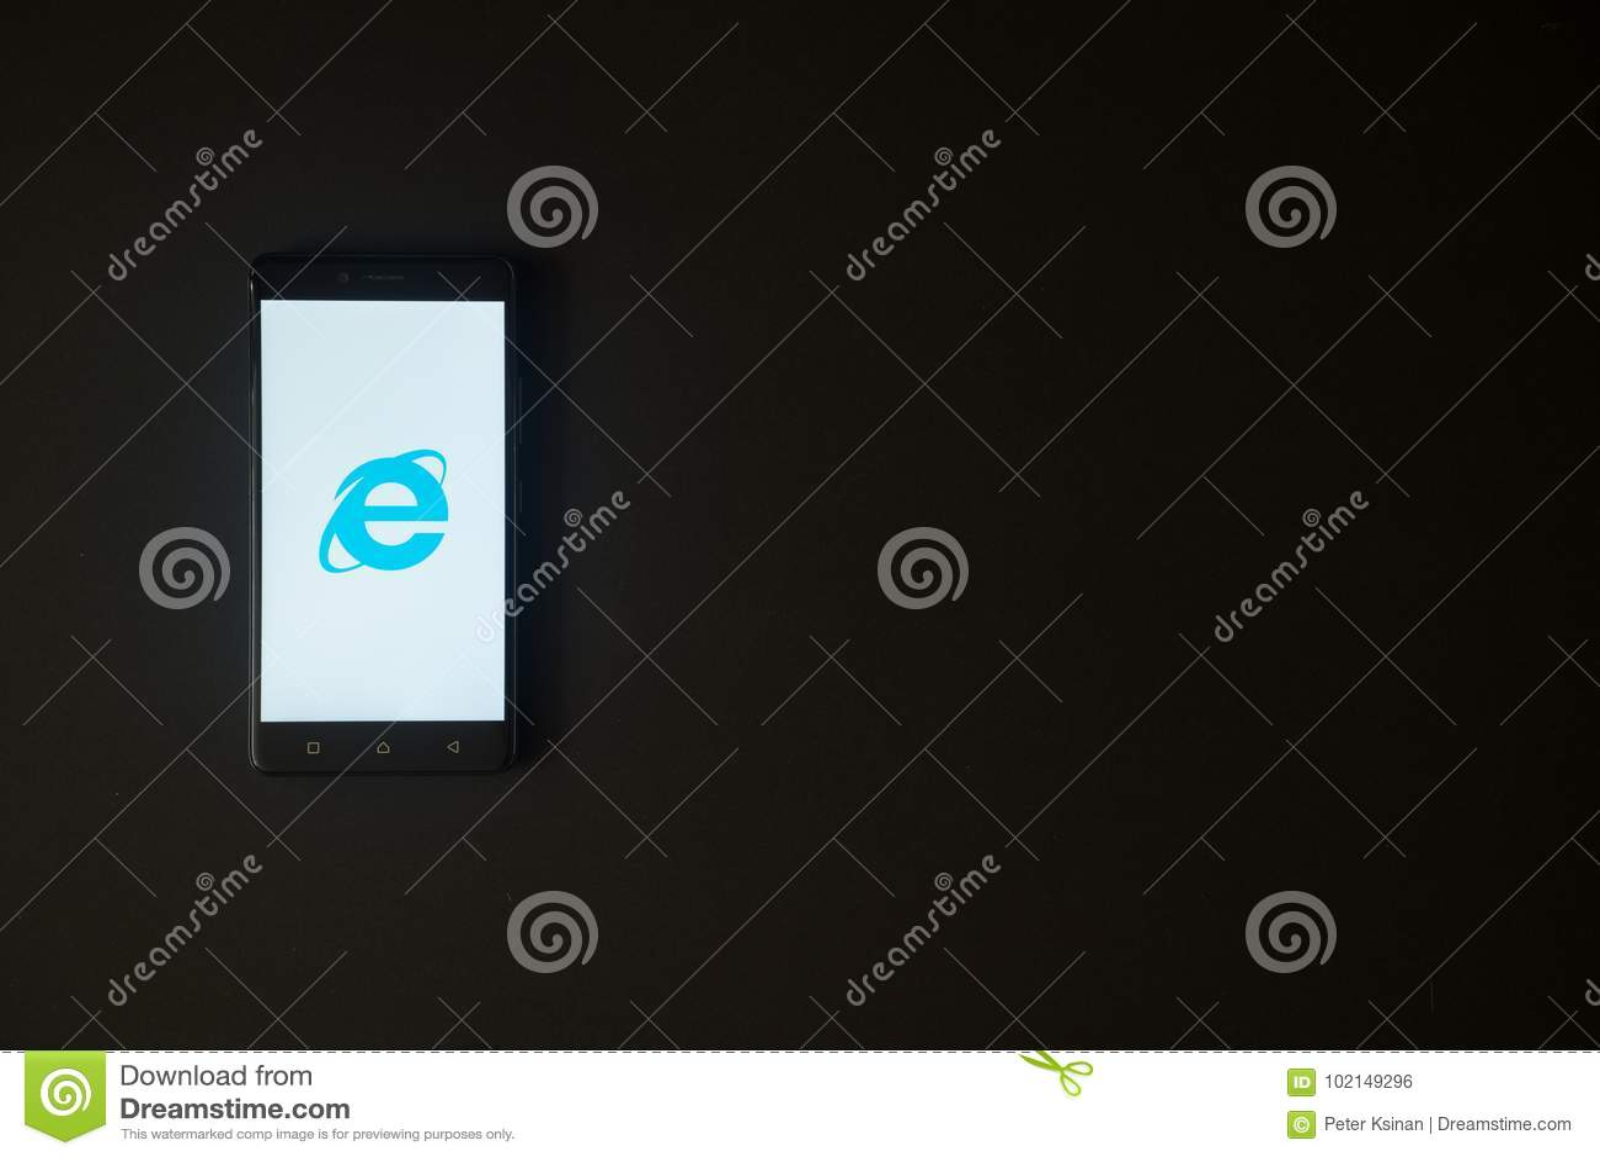 Internet Explorer Logo On Smartphone Screen On Black ...